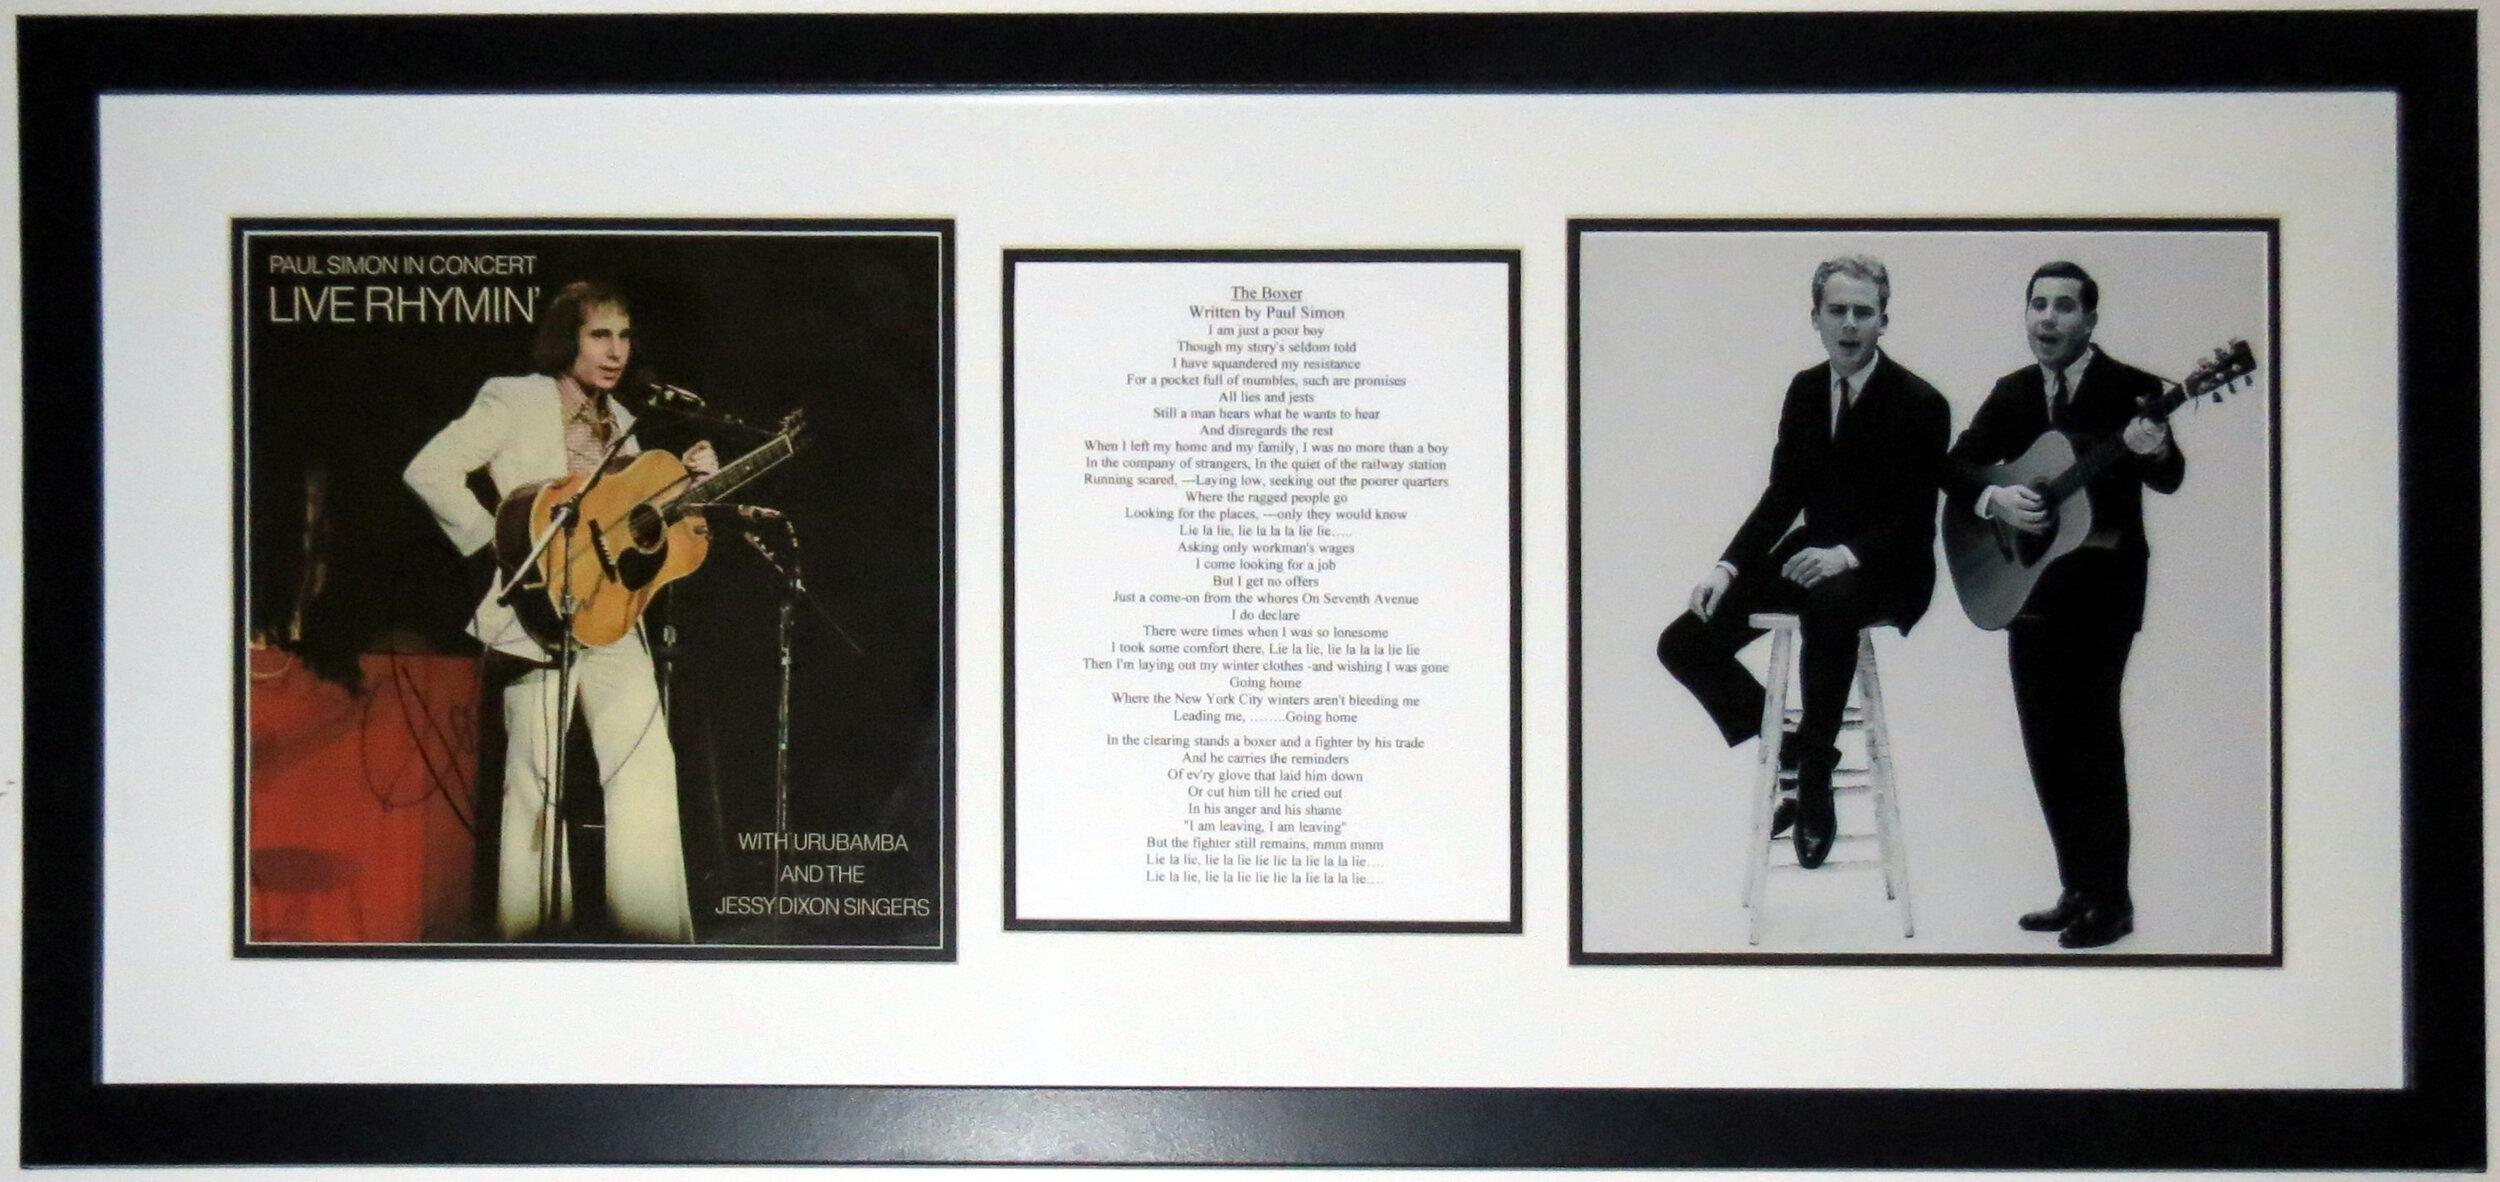 Paul Simon Signed Simon and Garfunkel Album - PSA DNA COA Authenticated - Professionally Framed & Photo & Lyrics 34x16